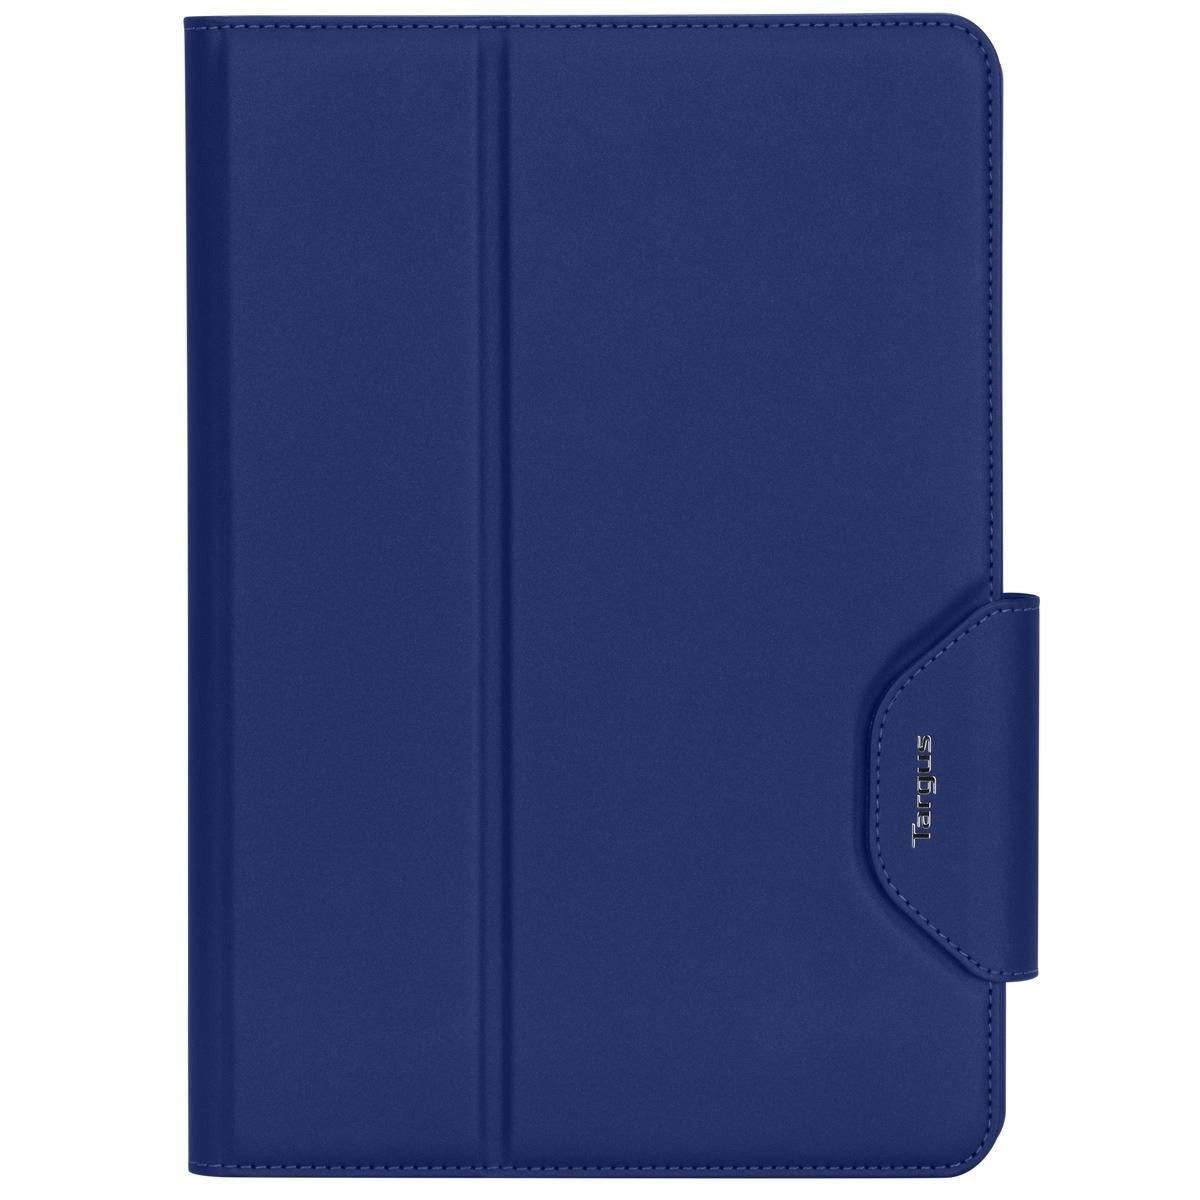 "Targus VersaVu Classic THZ85502GL Carrying Case for 26.7 cm (10.5"") Apple iPad (7th Generation), iPad Air, iPad Pro - Blue"